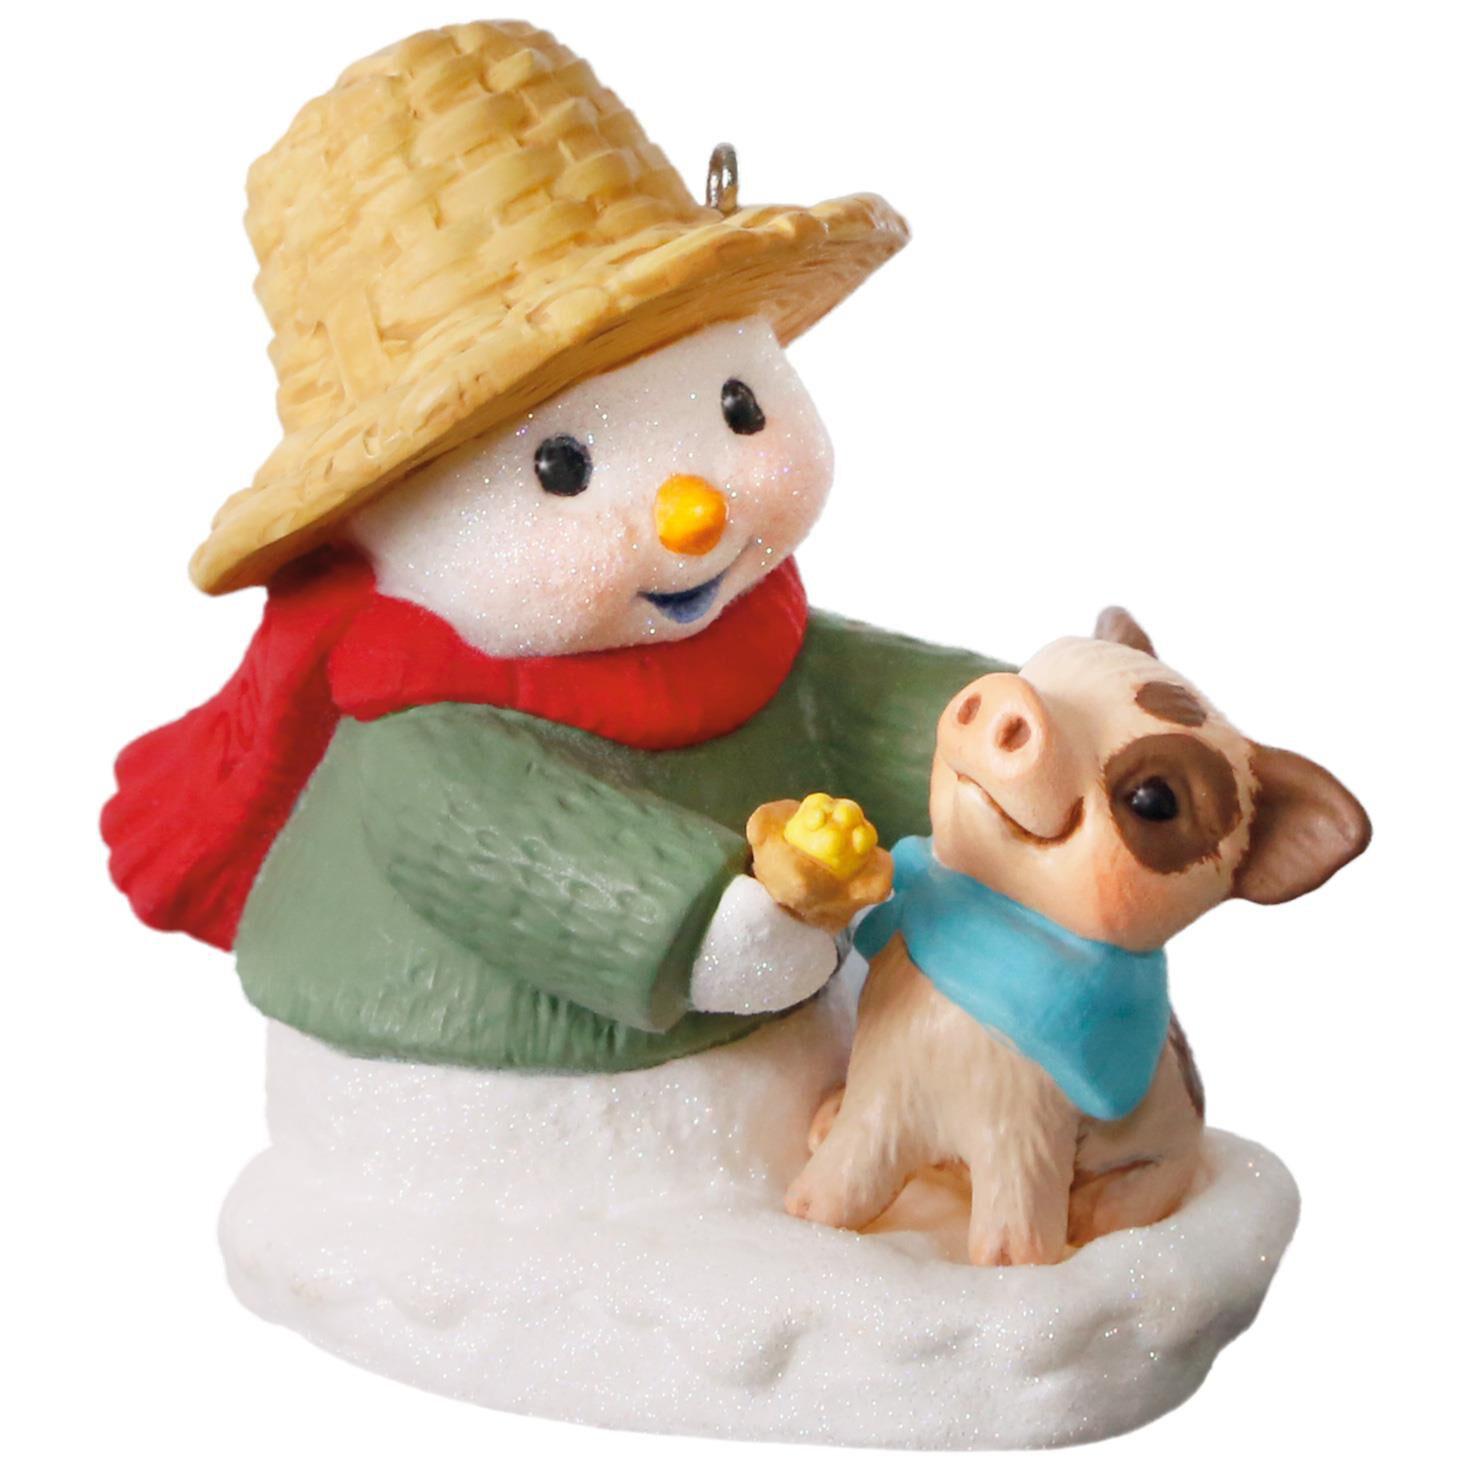 Snow Buddies Snowman and Pig Ornament  Keepsake Ornaments  Hallmark